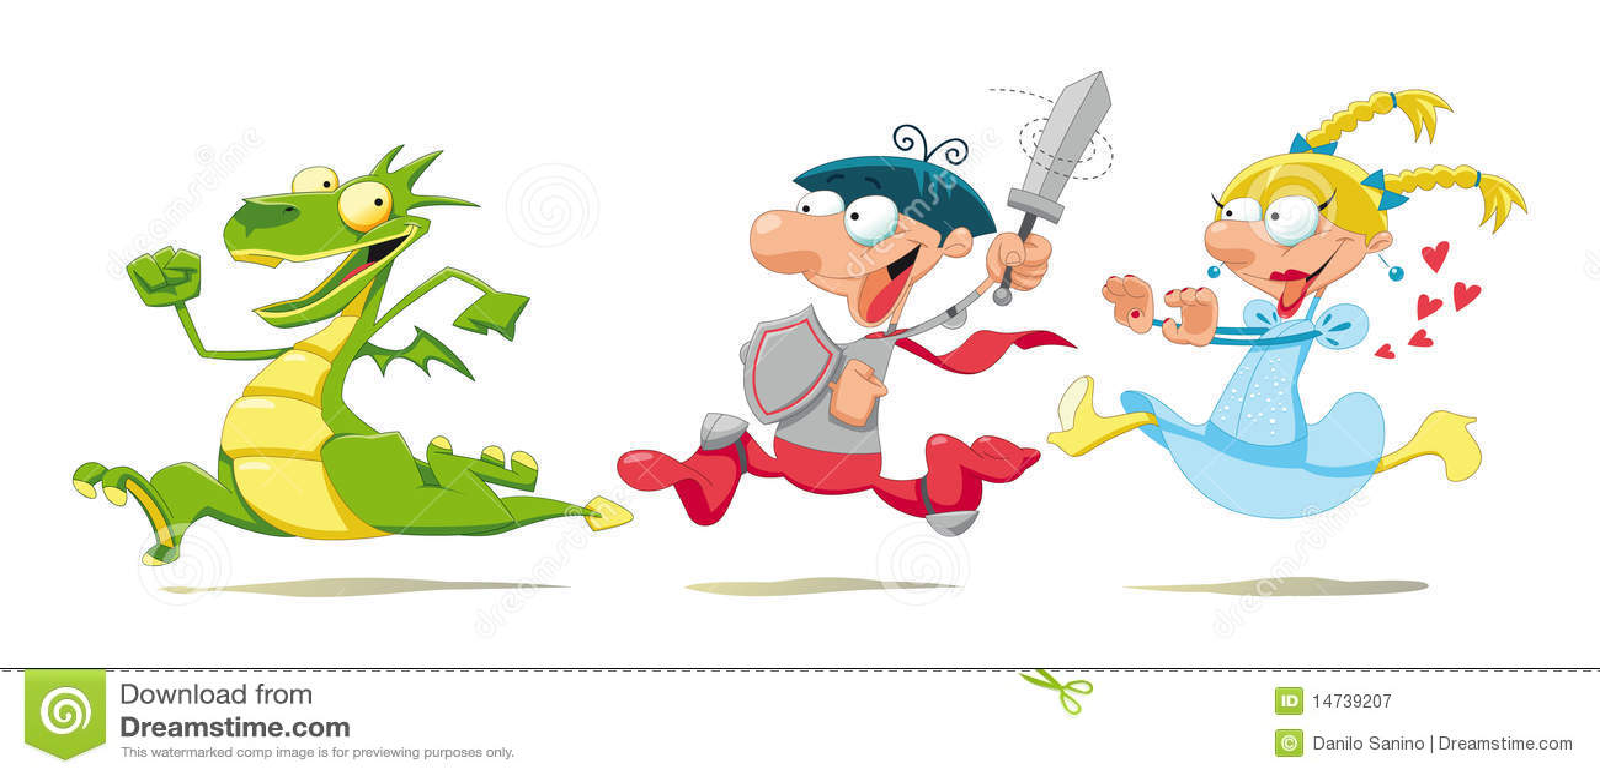 Dragon prince et princesse illustration de vecteur illustration du m di val imagination - Prince et princesse dessin ...